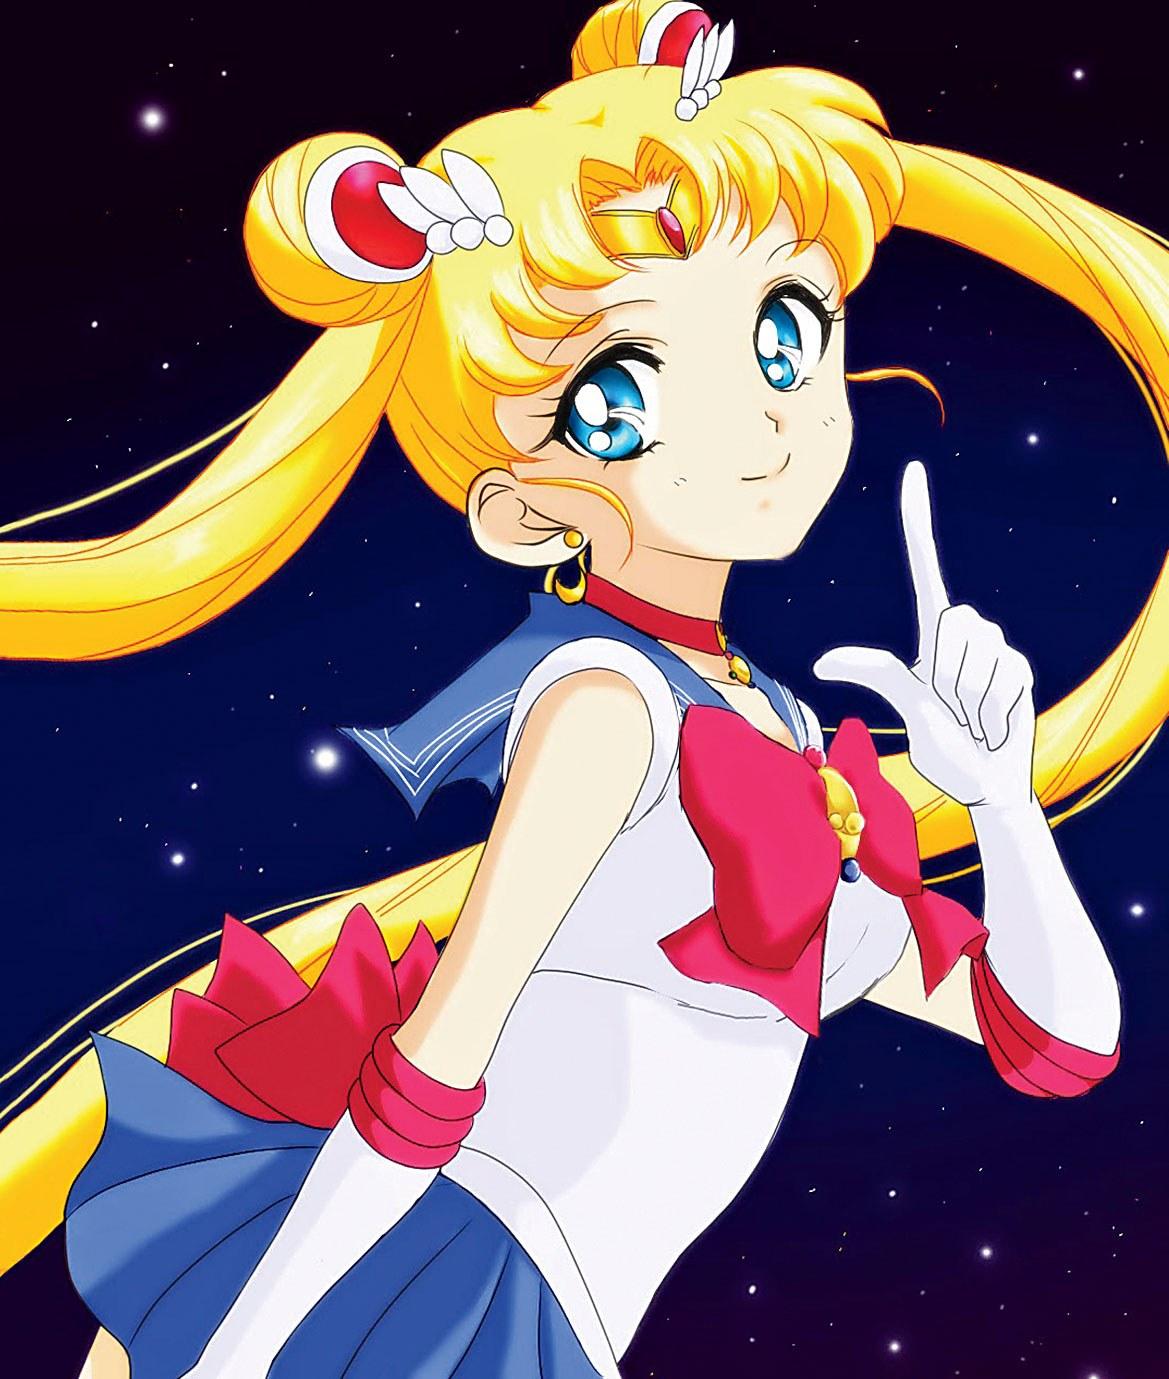 sailor moon хентай